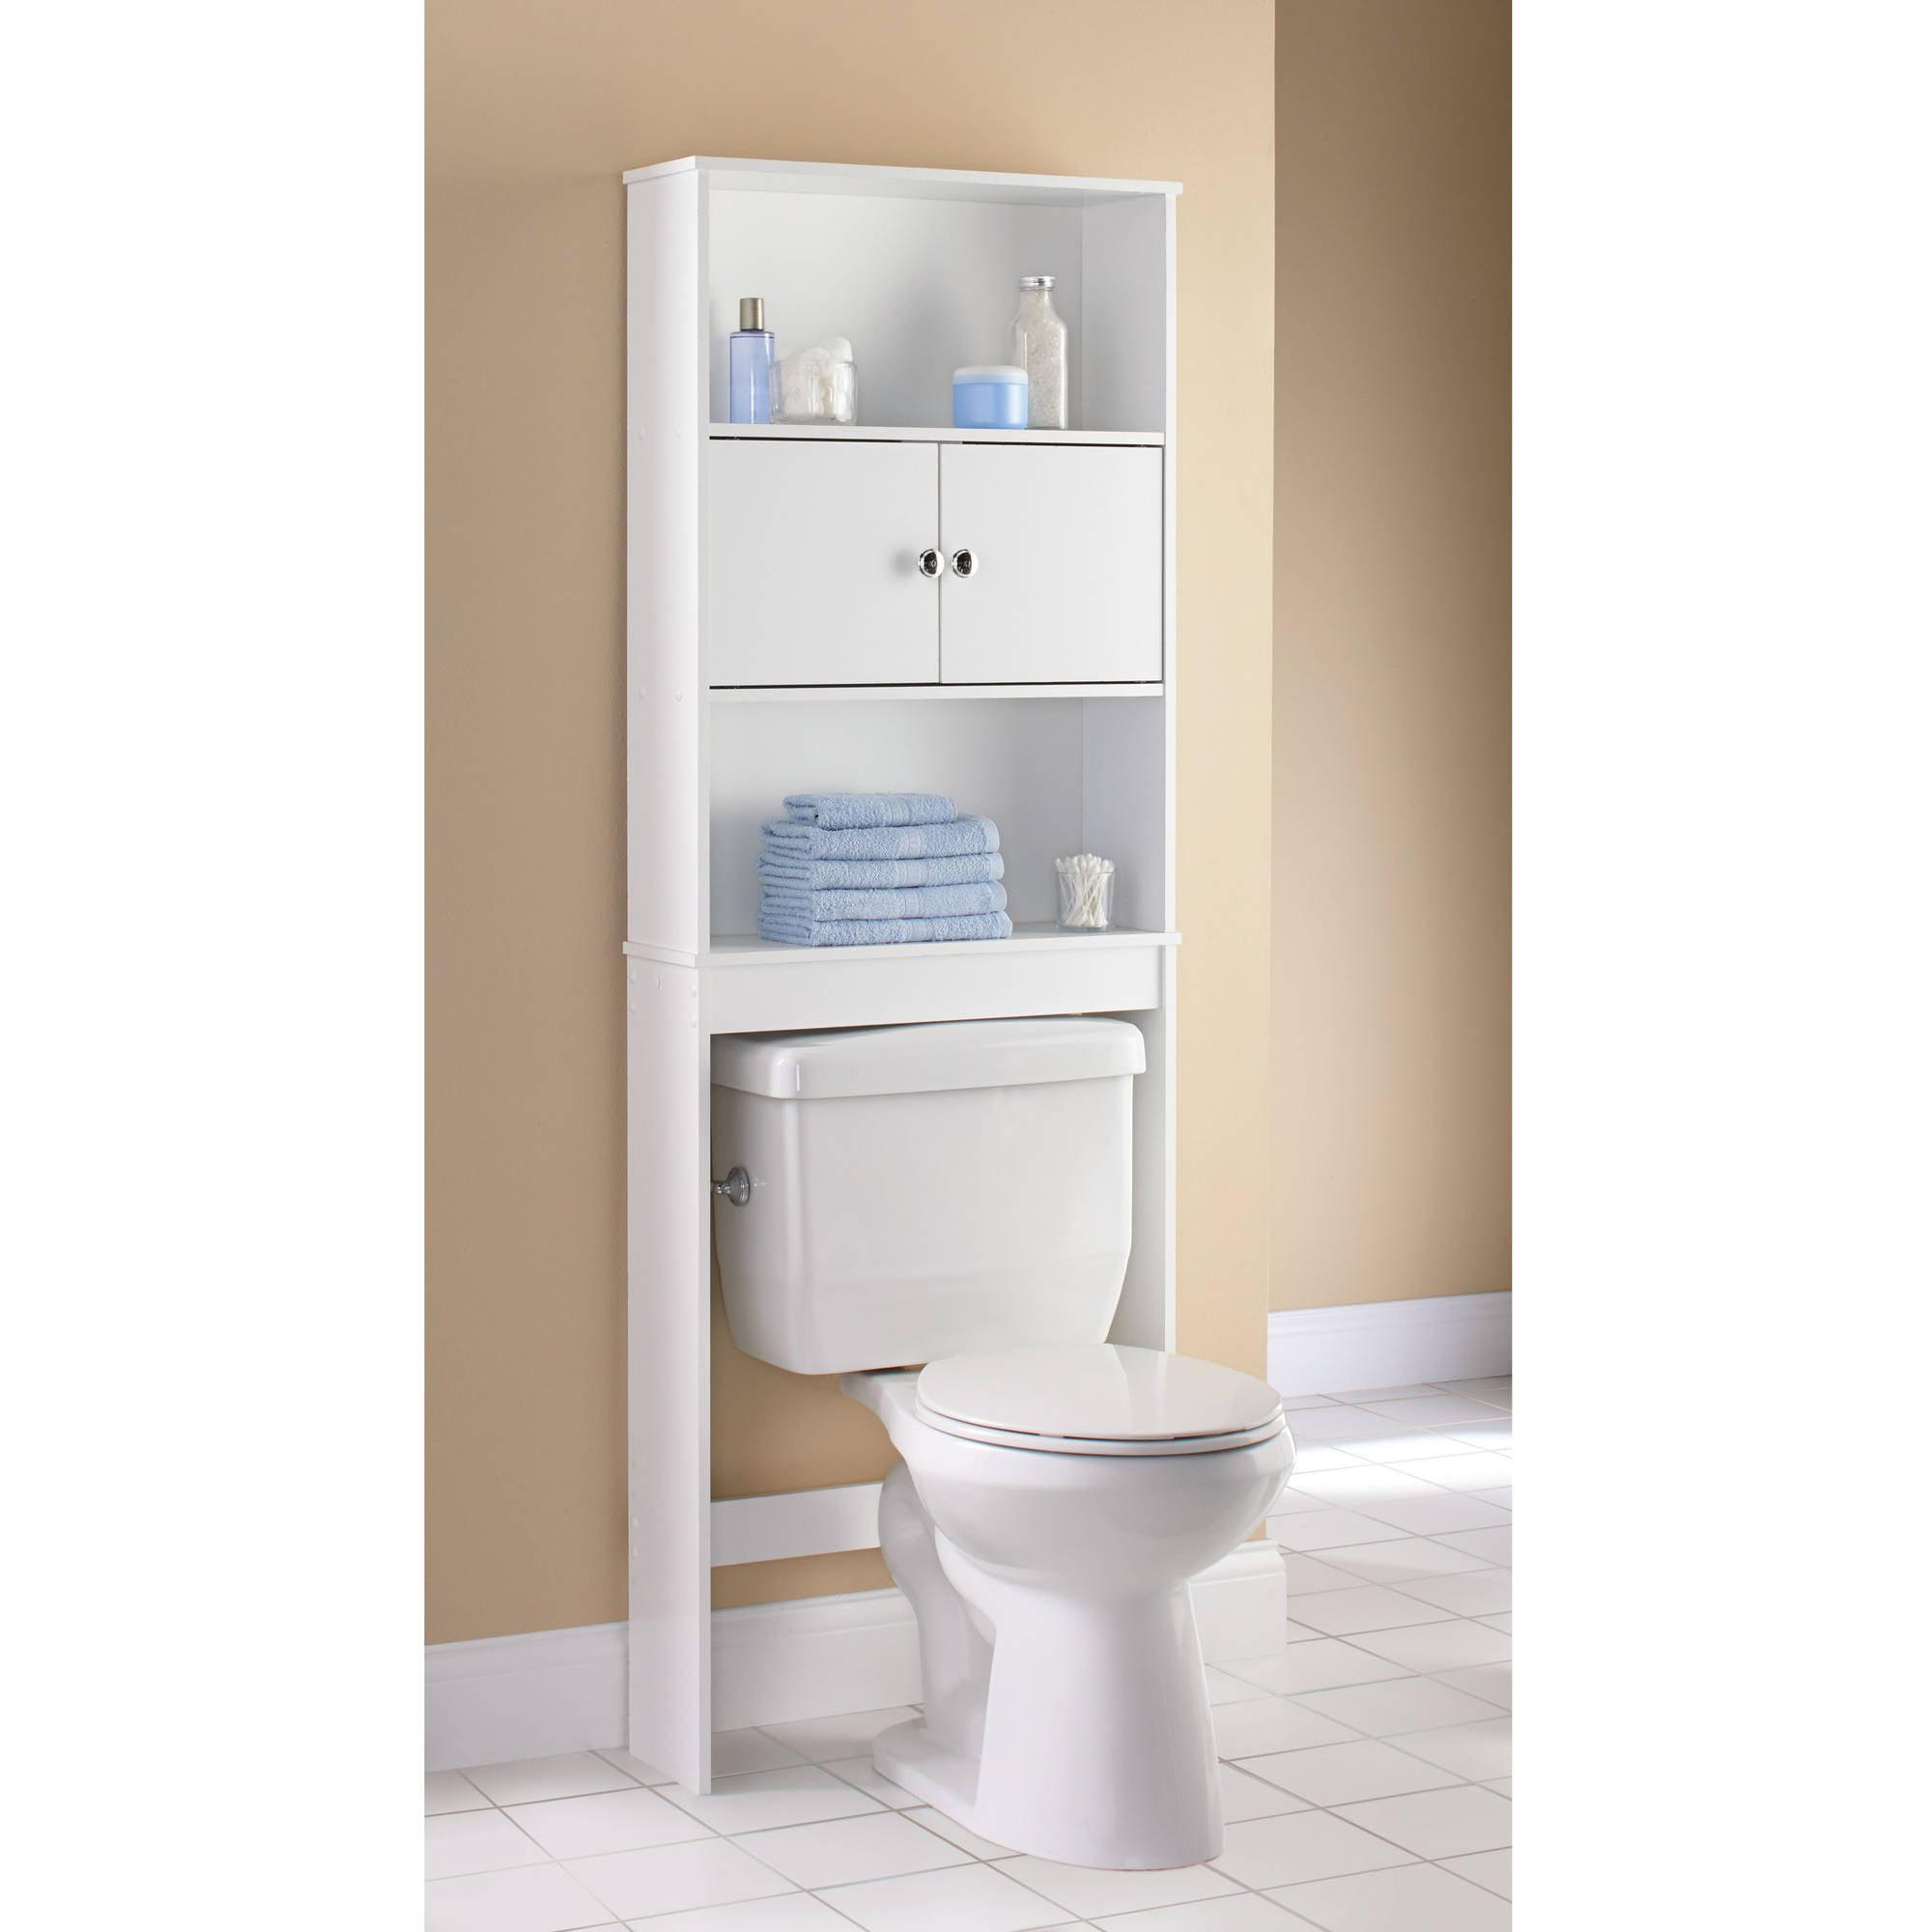 Mainstays Bathroom Space Saver, White